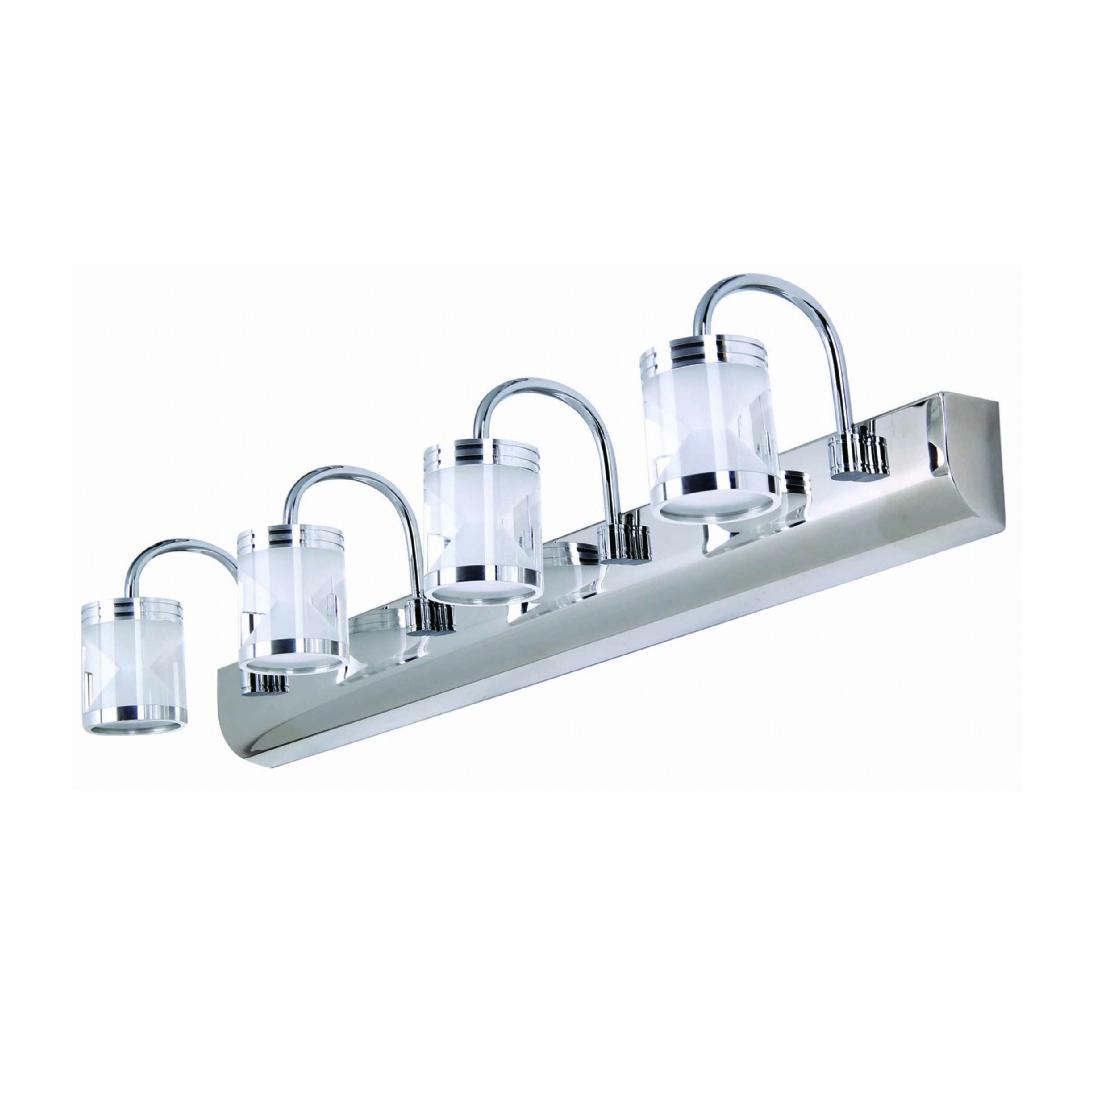 K2 GLOBAL KSL142 - Dekoratif LED Aplik